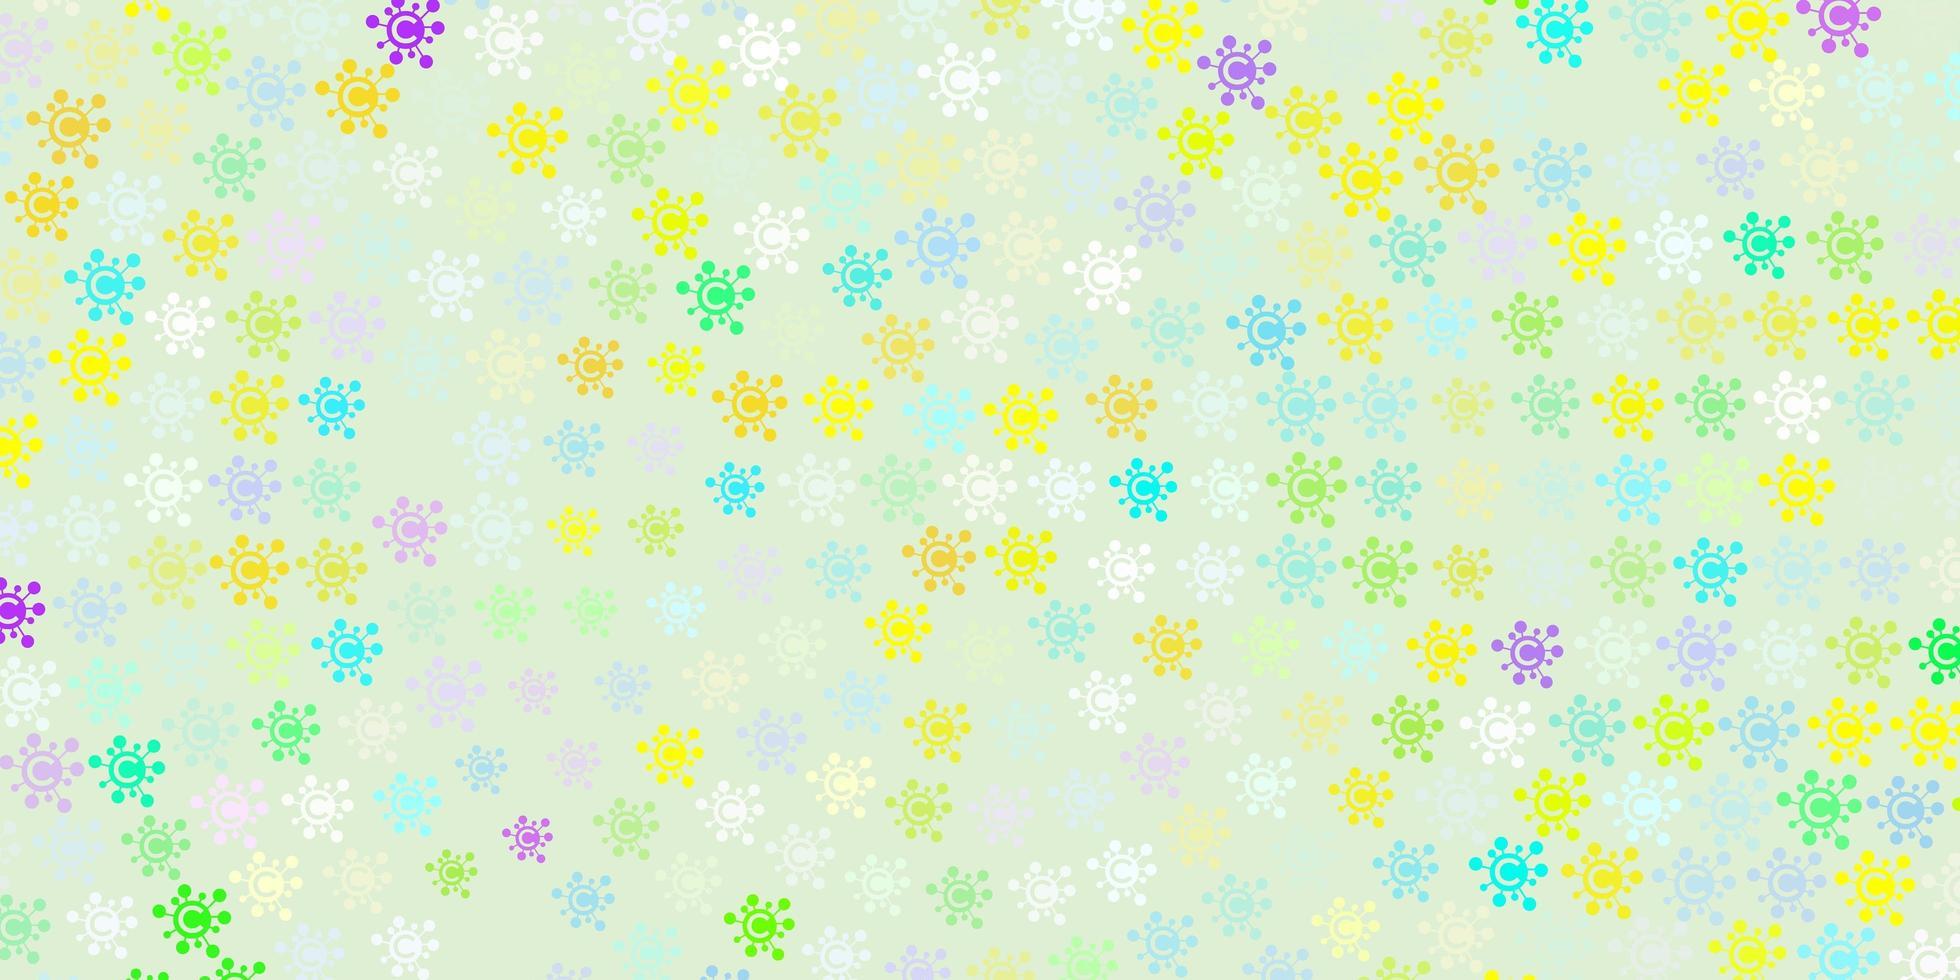 Light Multicolor vector background with covid-19 symbols